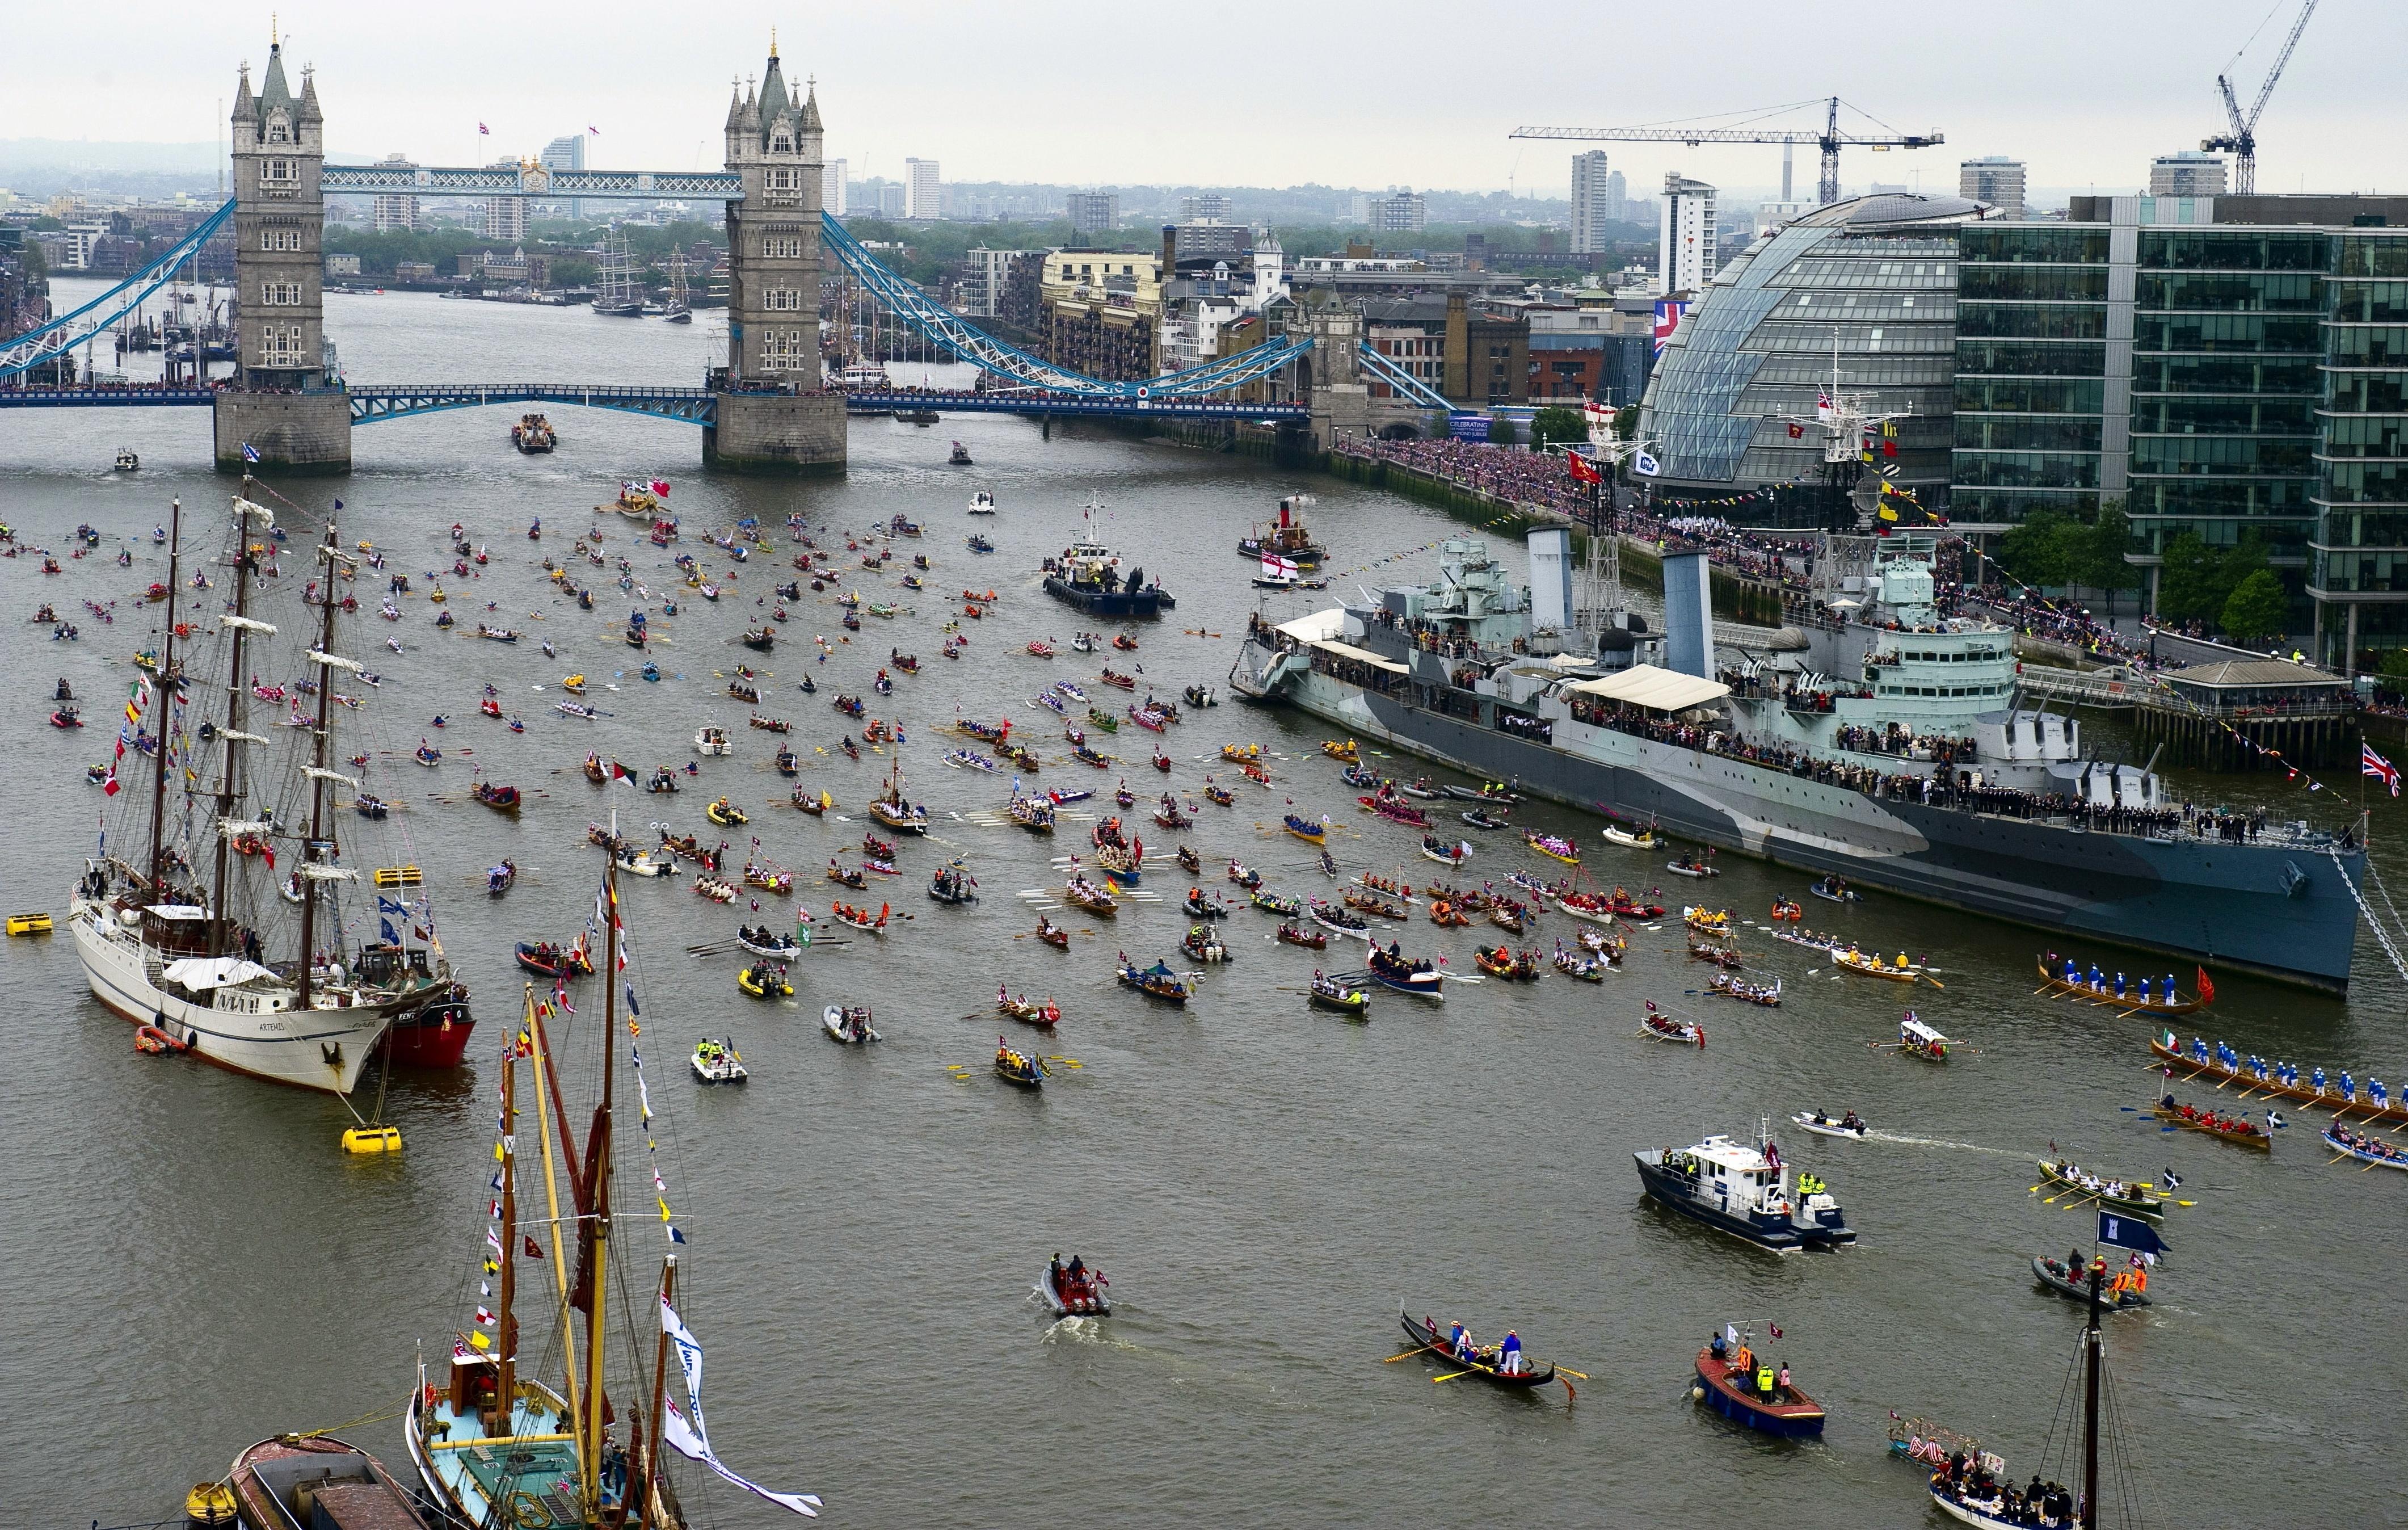 The Manpowered flotilla